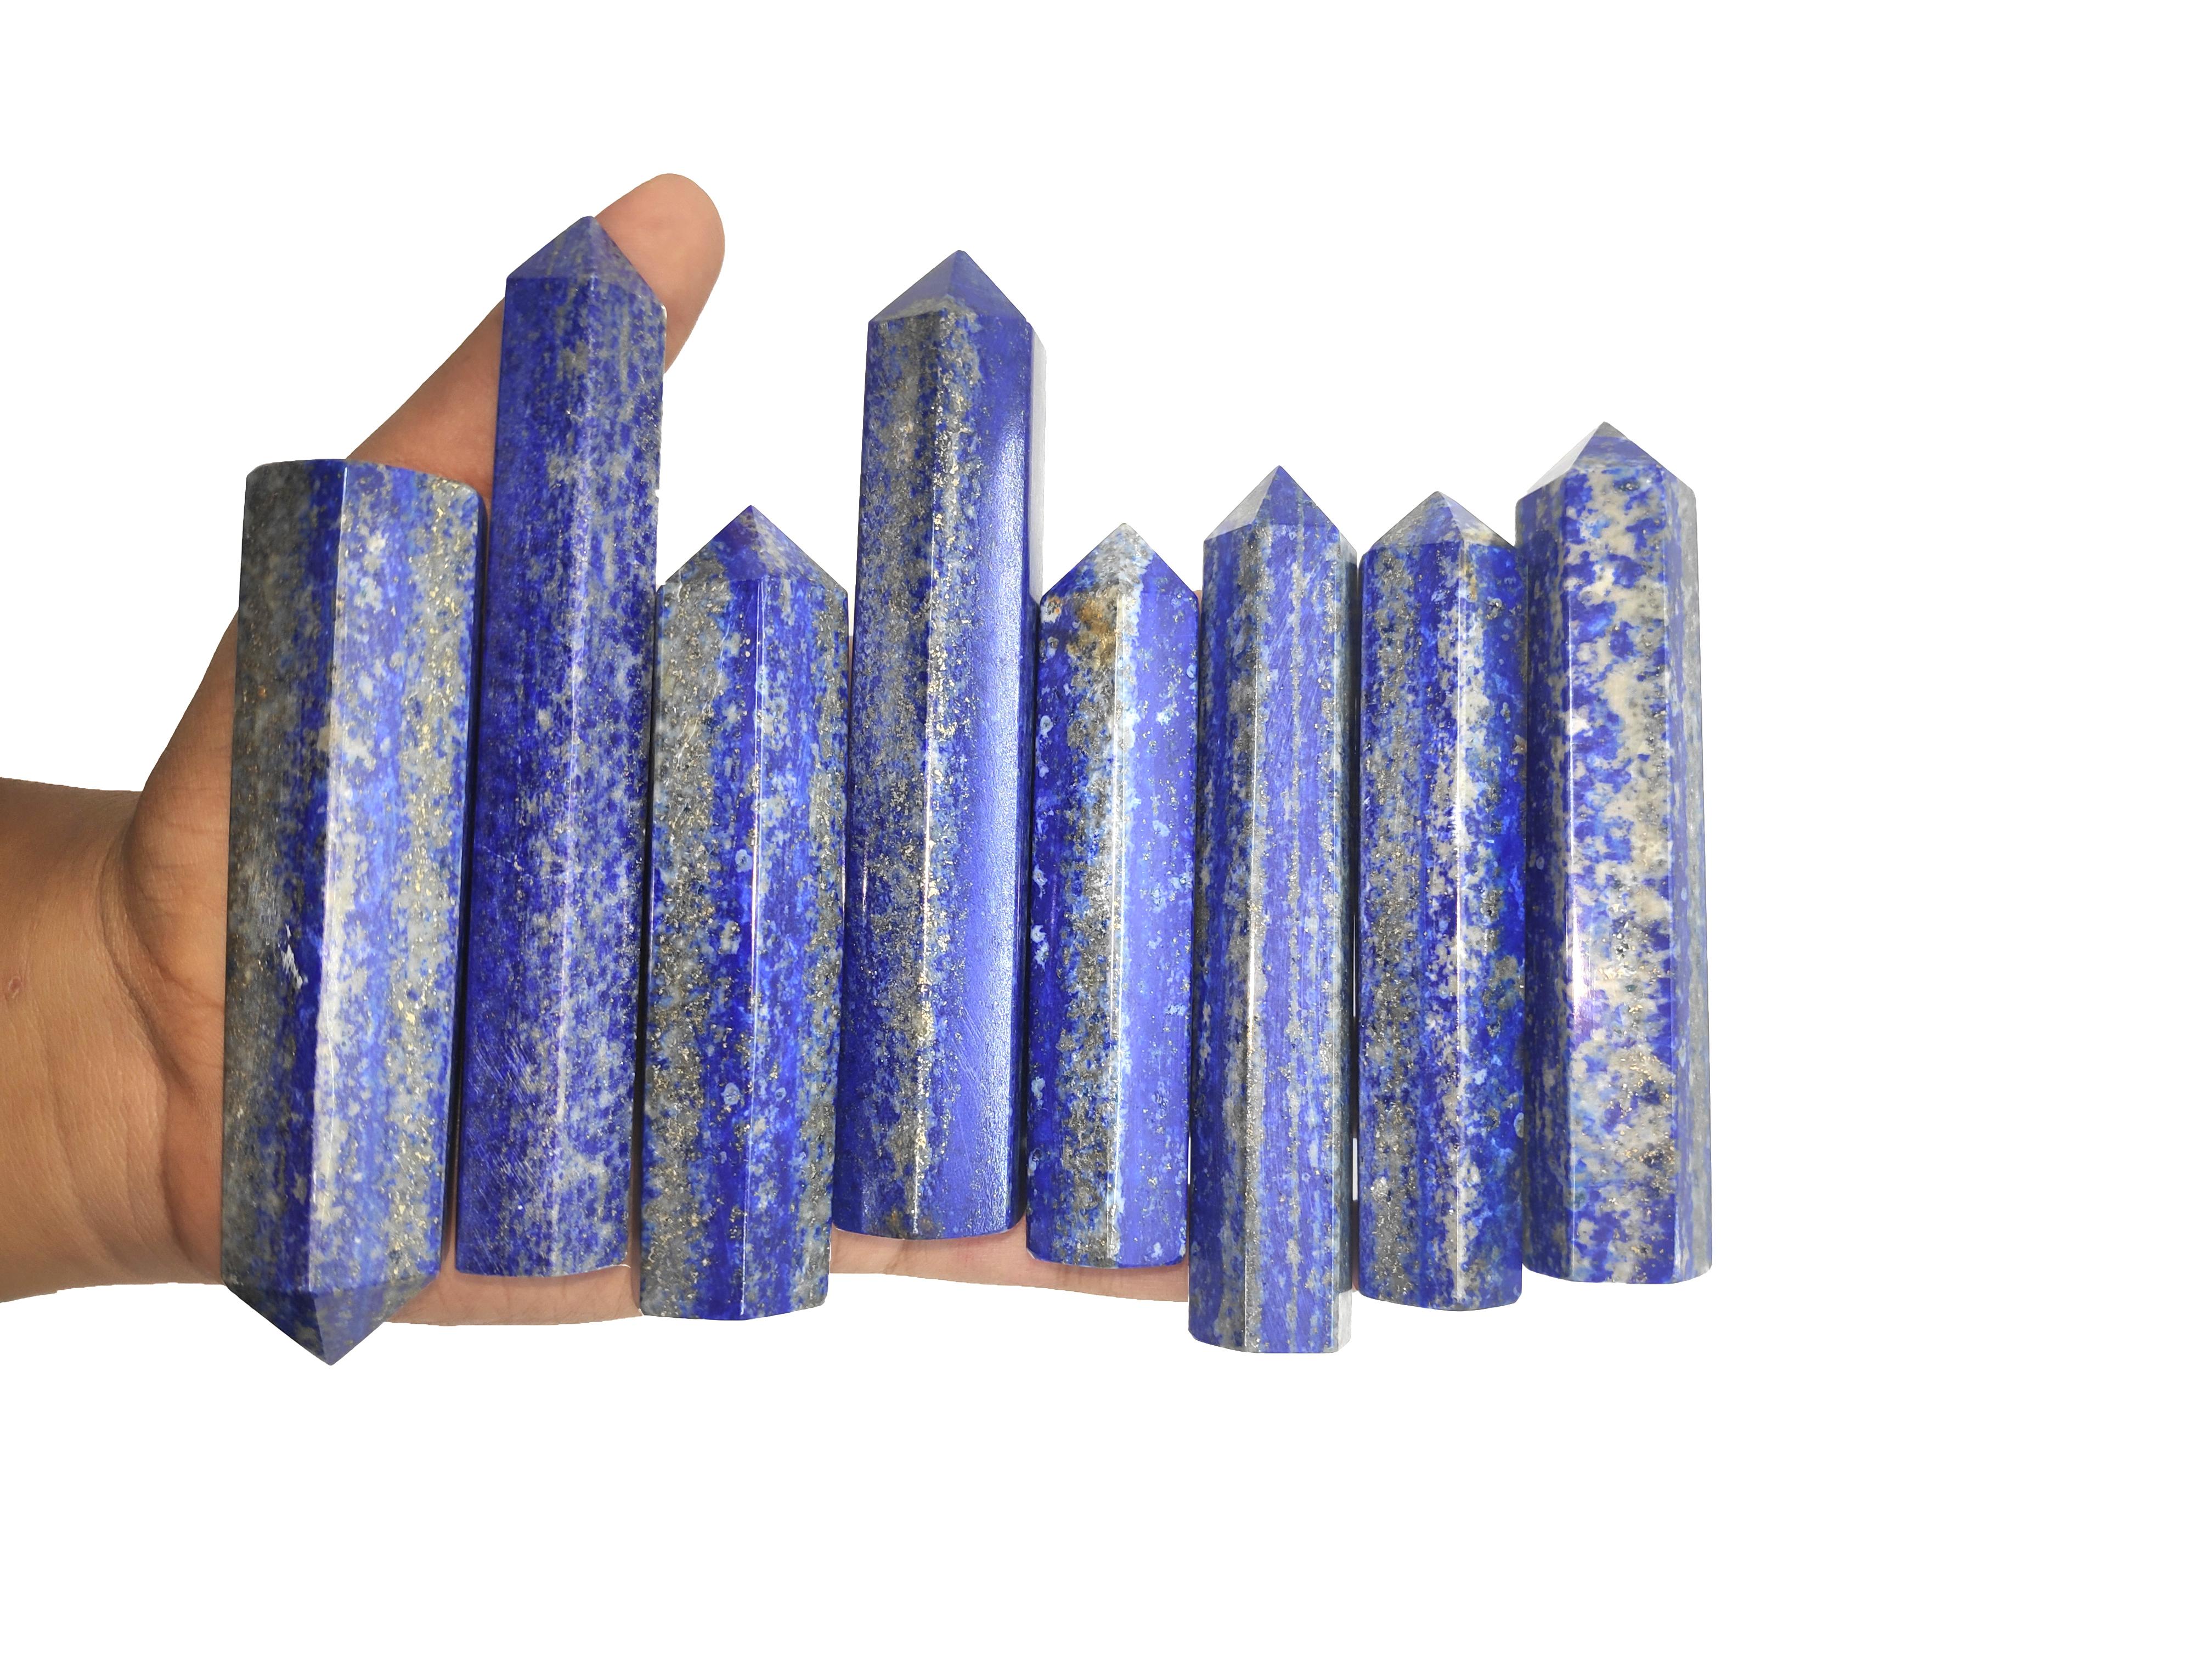 Lapis lazuali towers